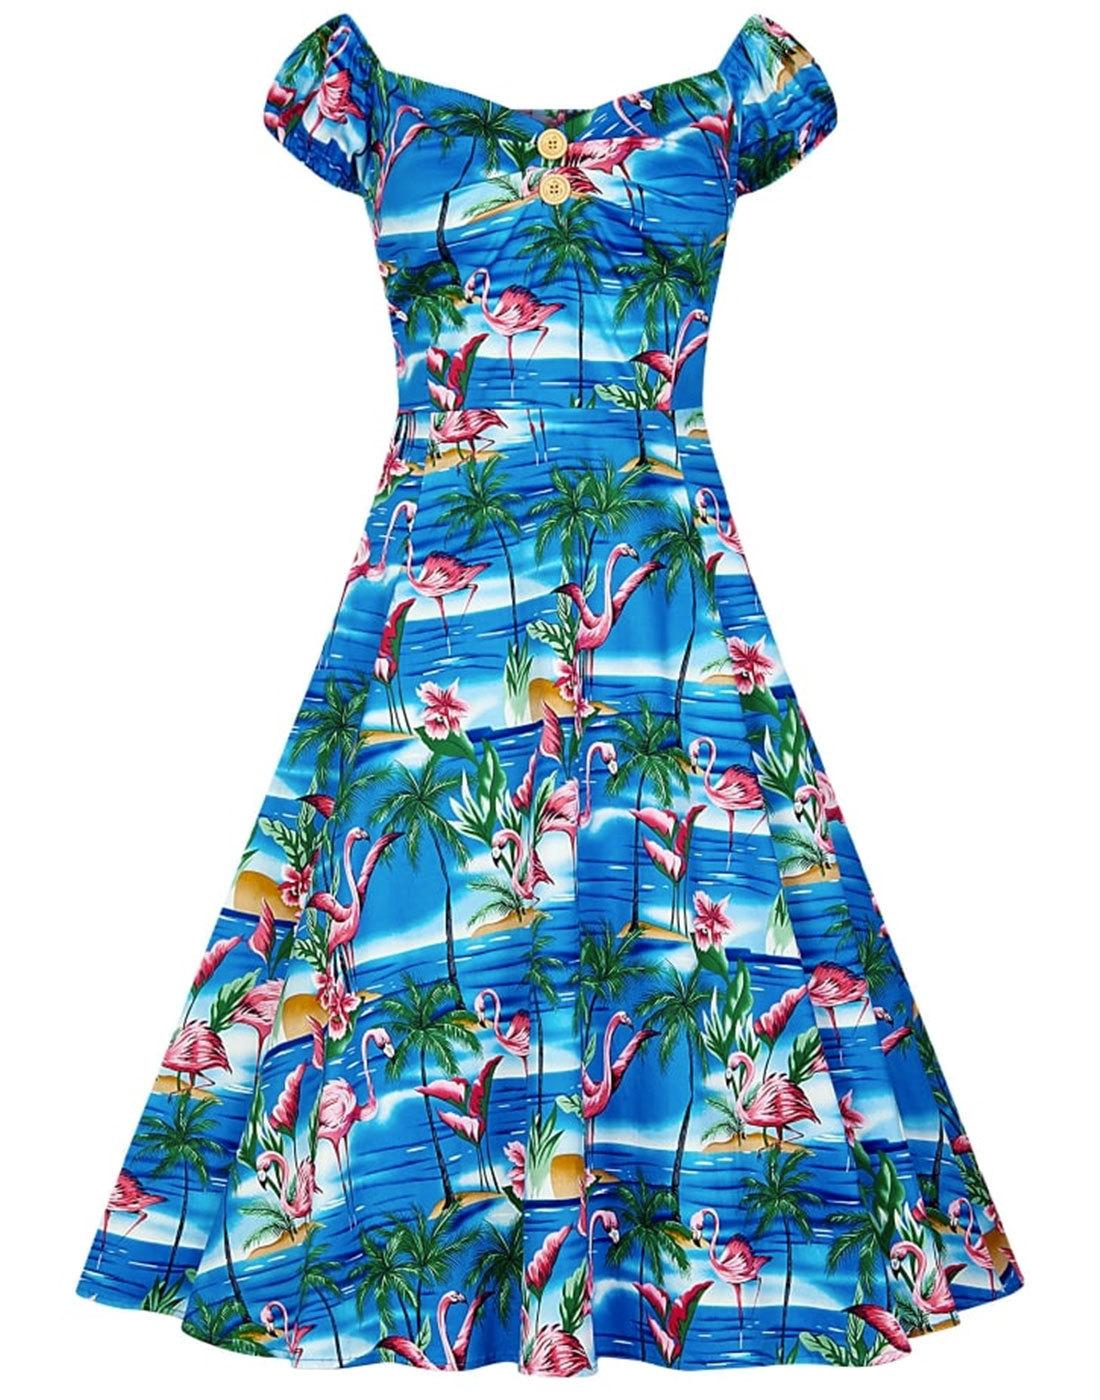 Dolores COLLECTIF Retro 50s Vintage Doll Dress